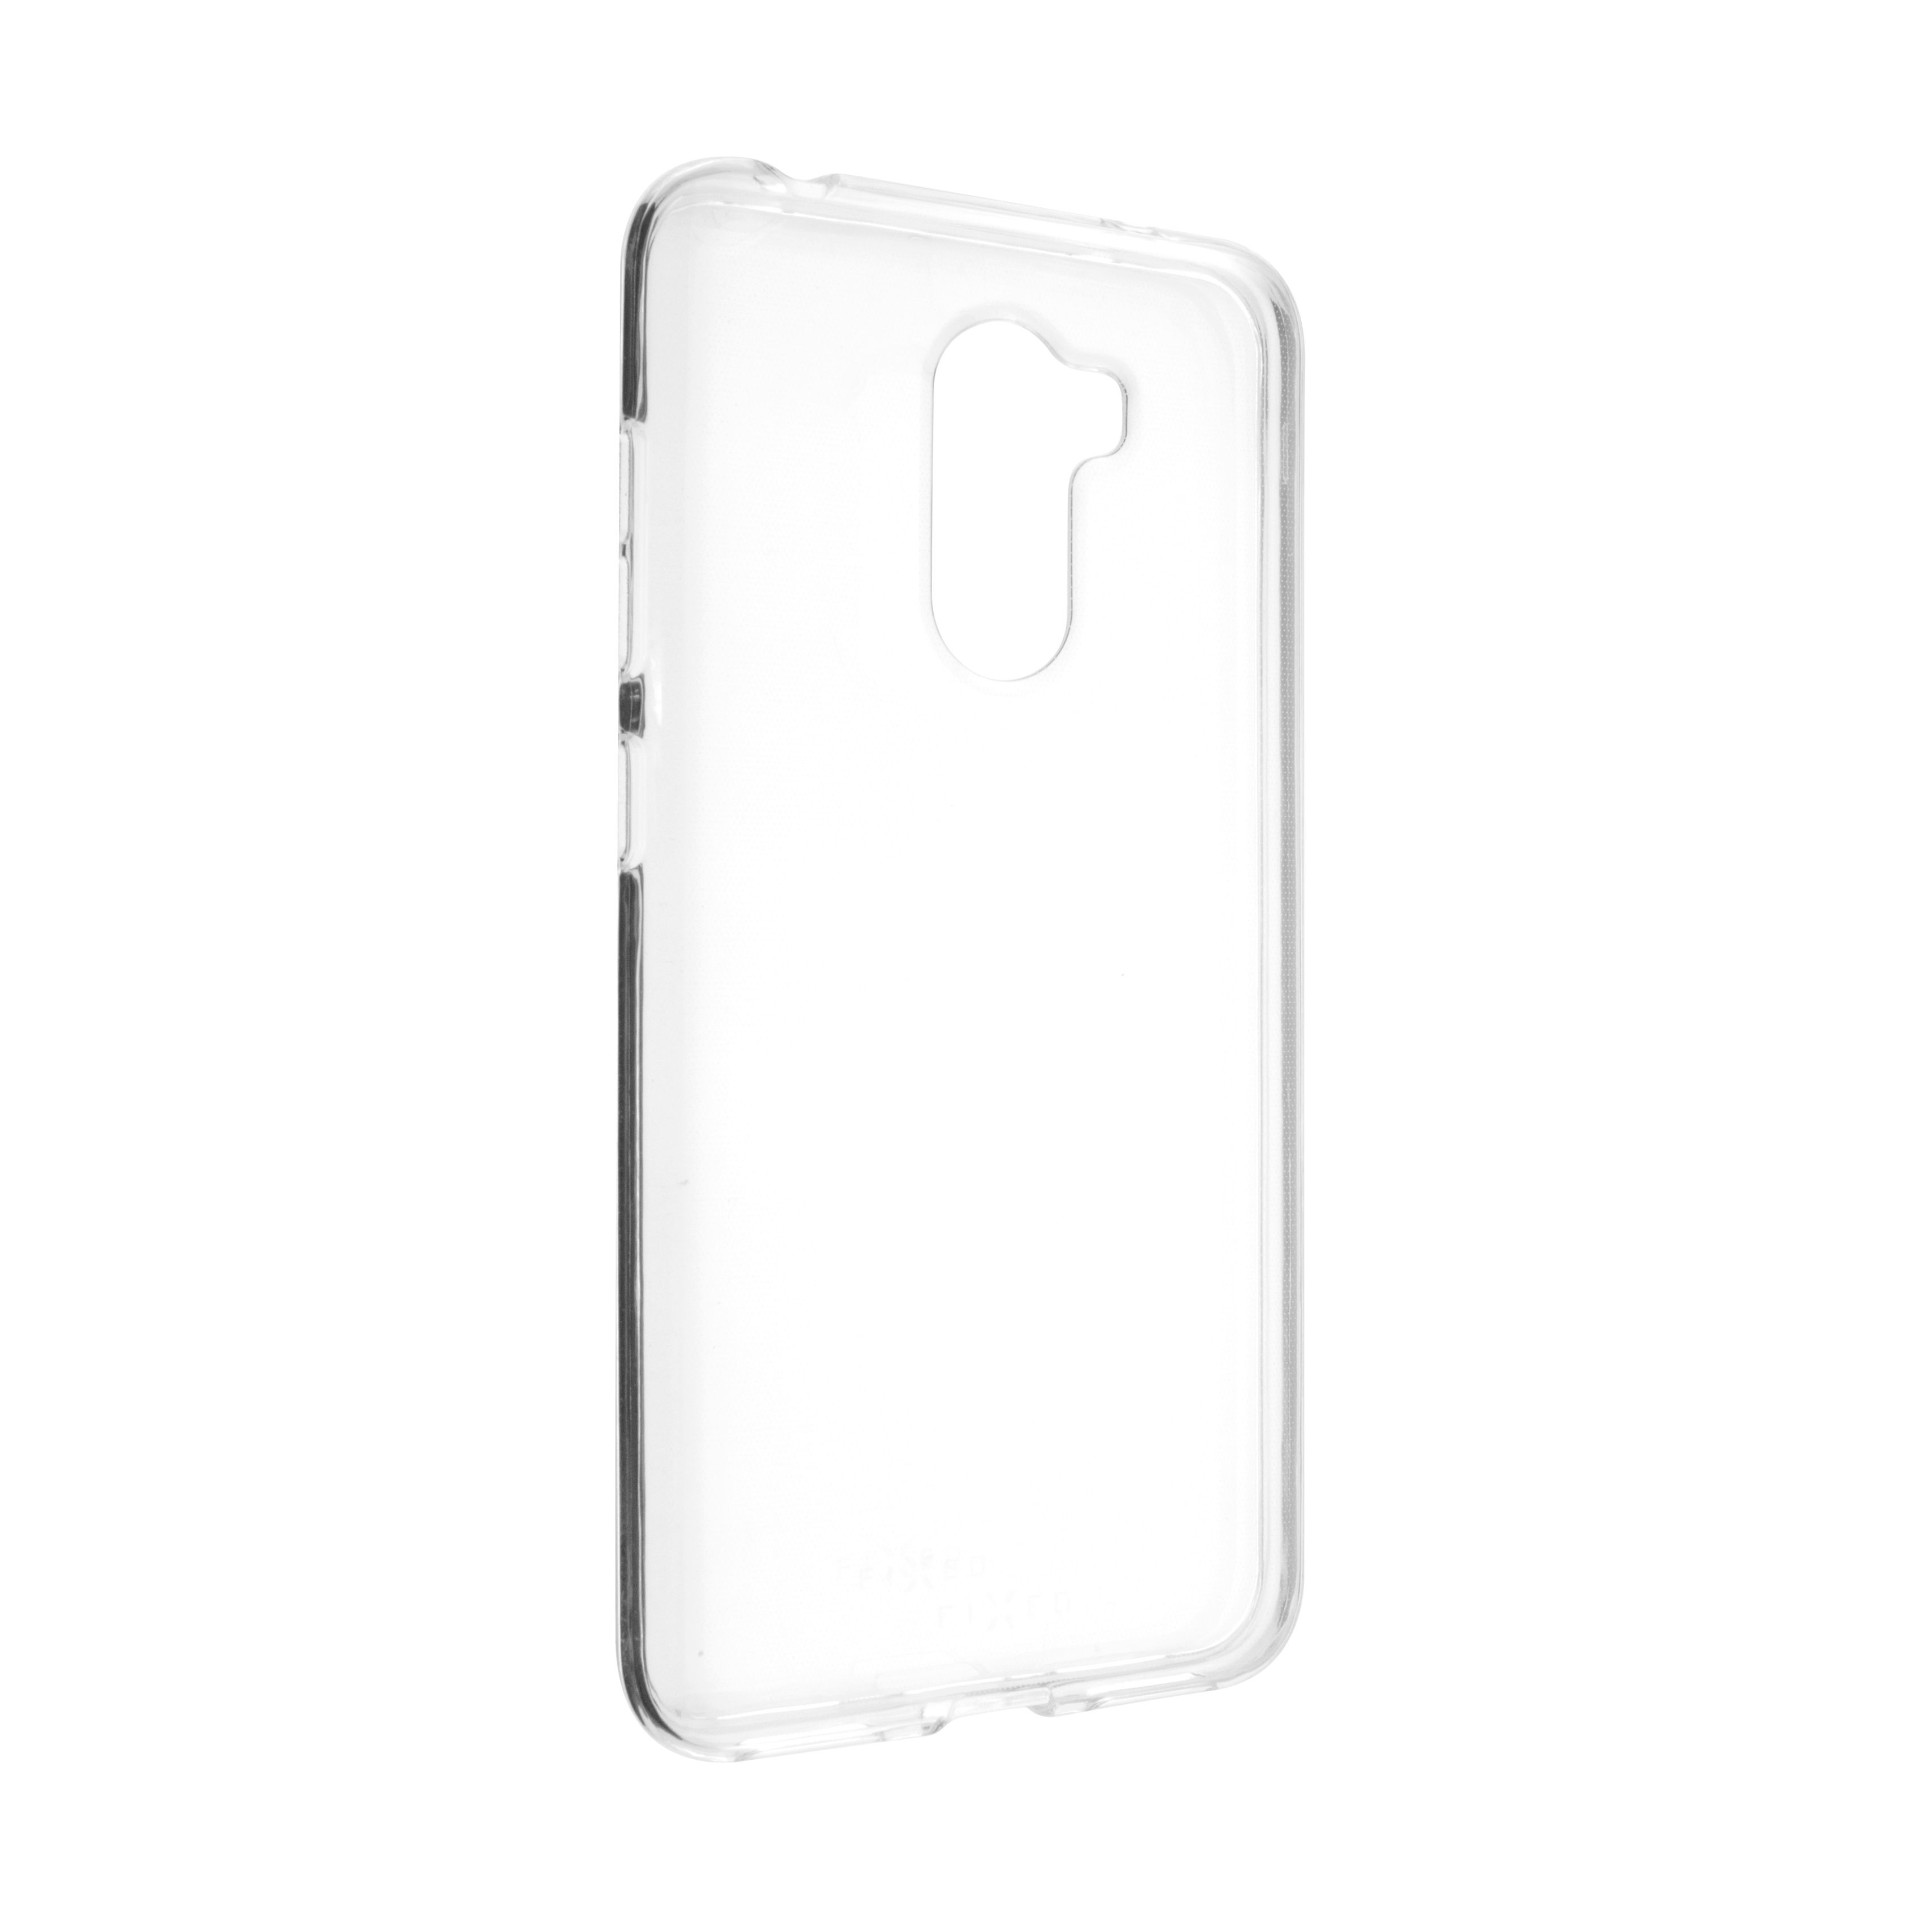 Ultratenké TPU gelové pouzdro FIXED Skin pro Xiaomi Pocophone F1, 0,6 mm, čiré